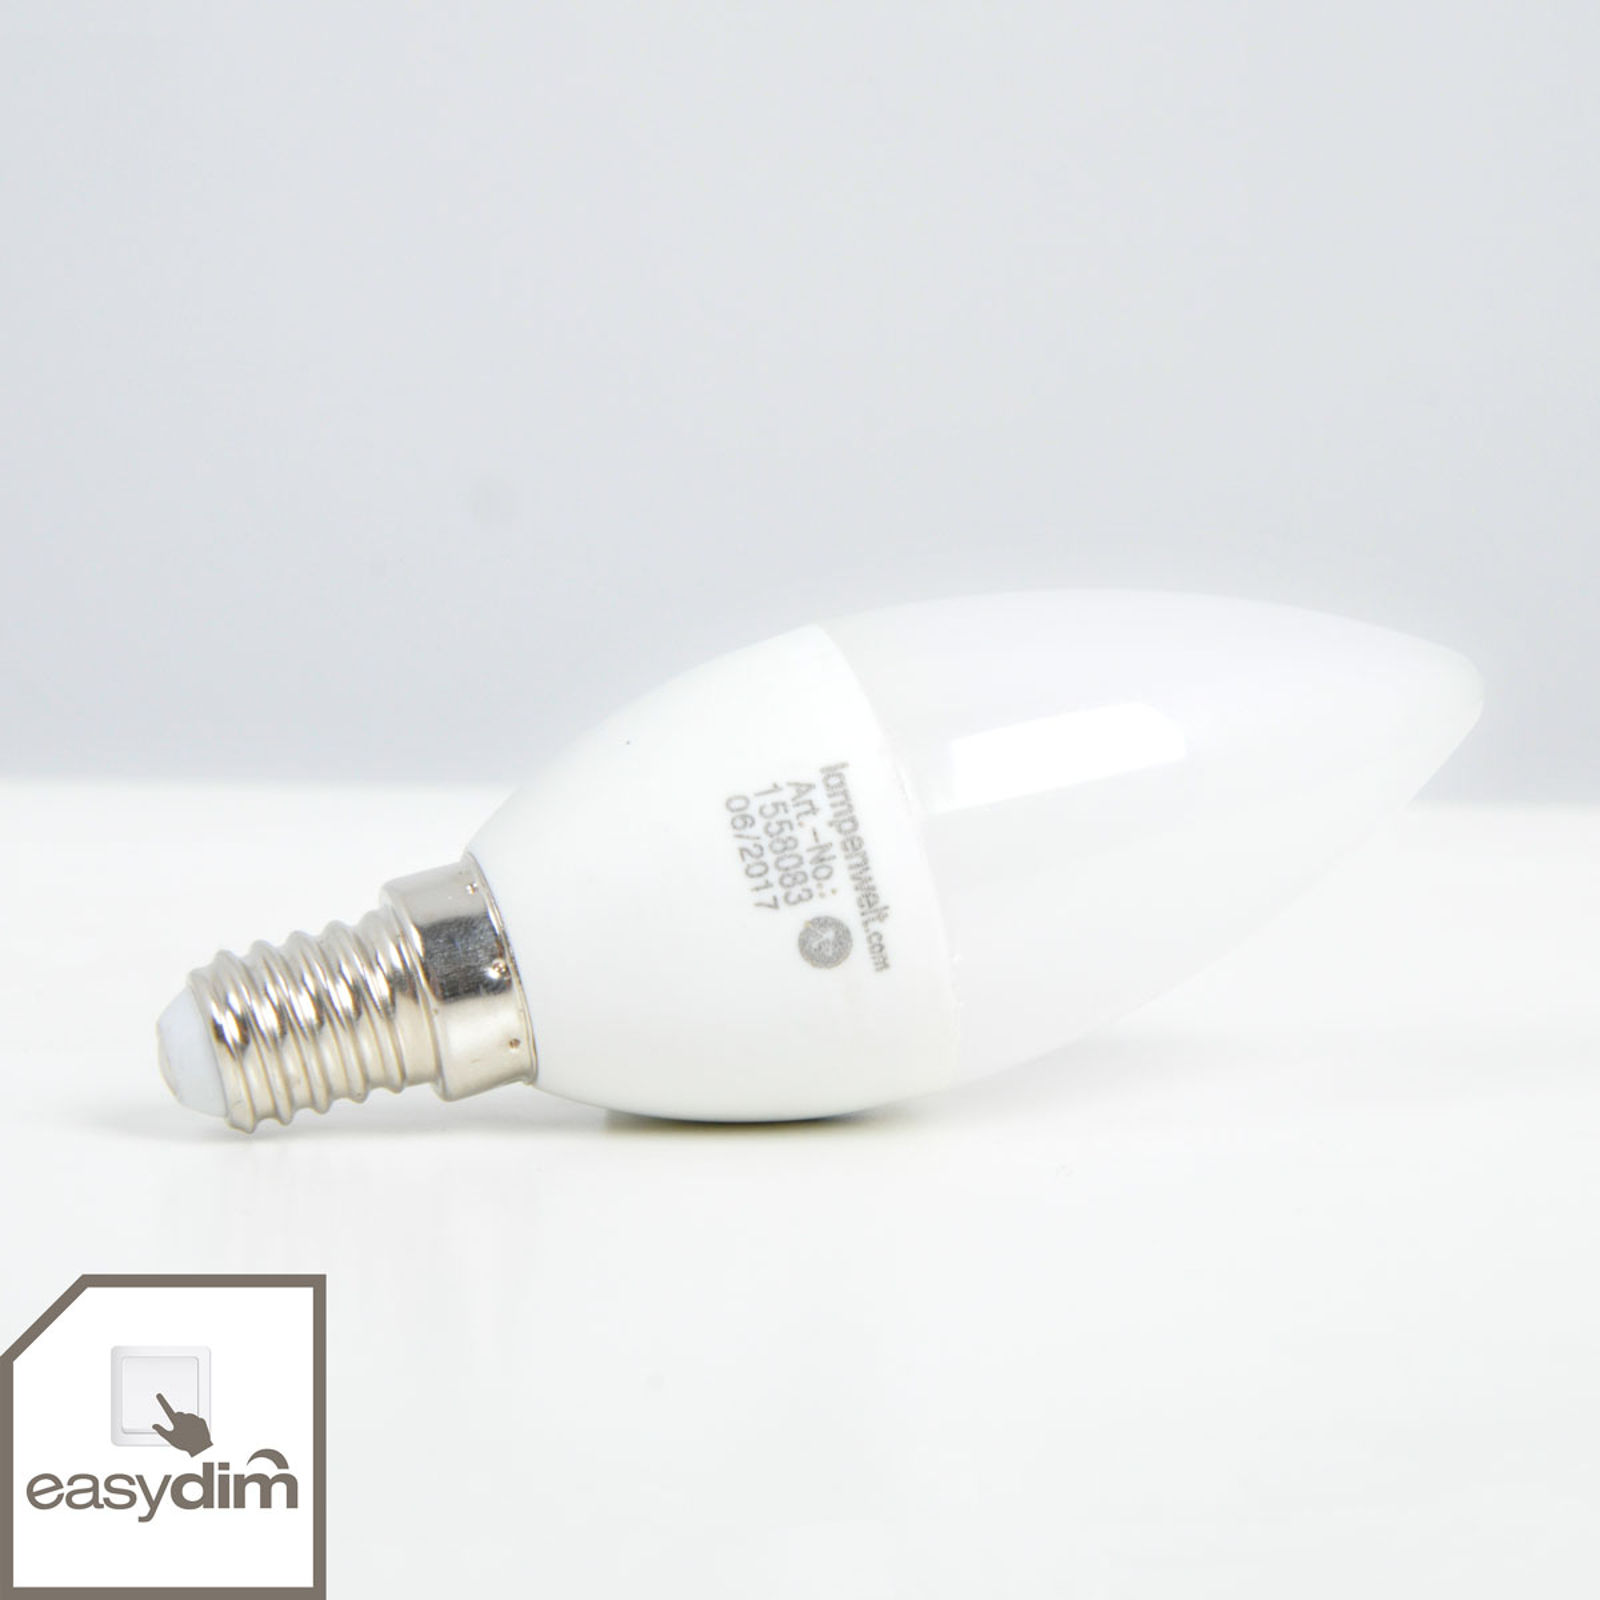 LED-ljuslampa E14 5W, varmvit, easydim